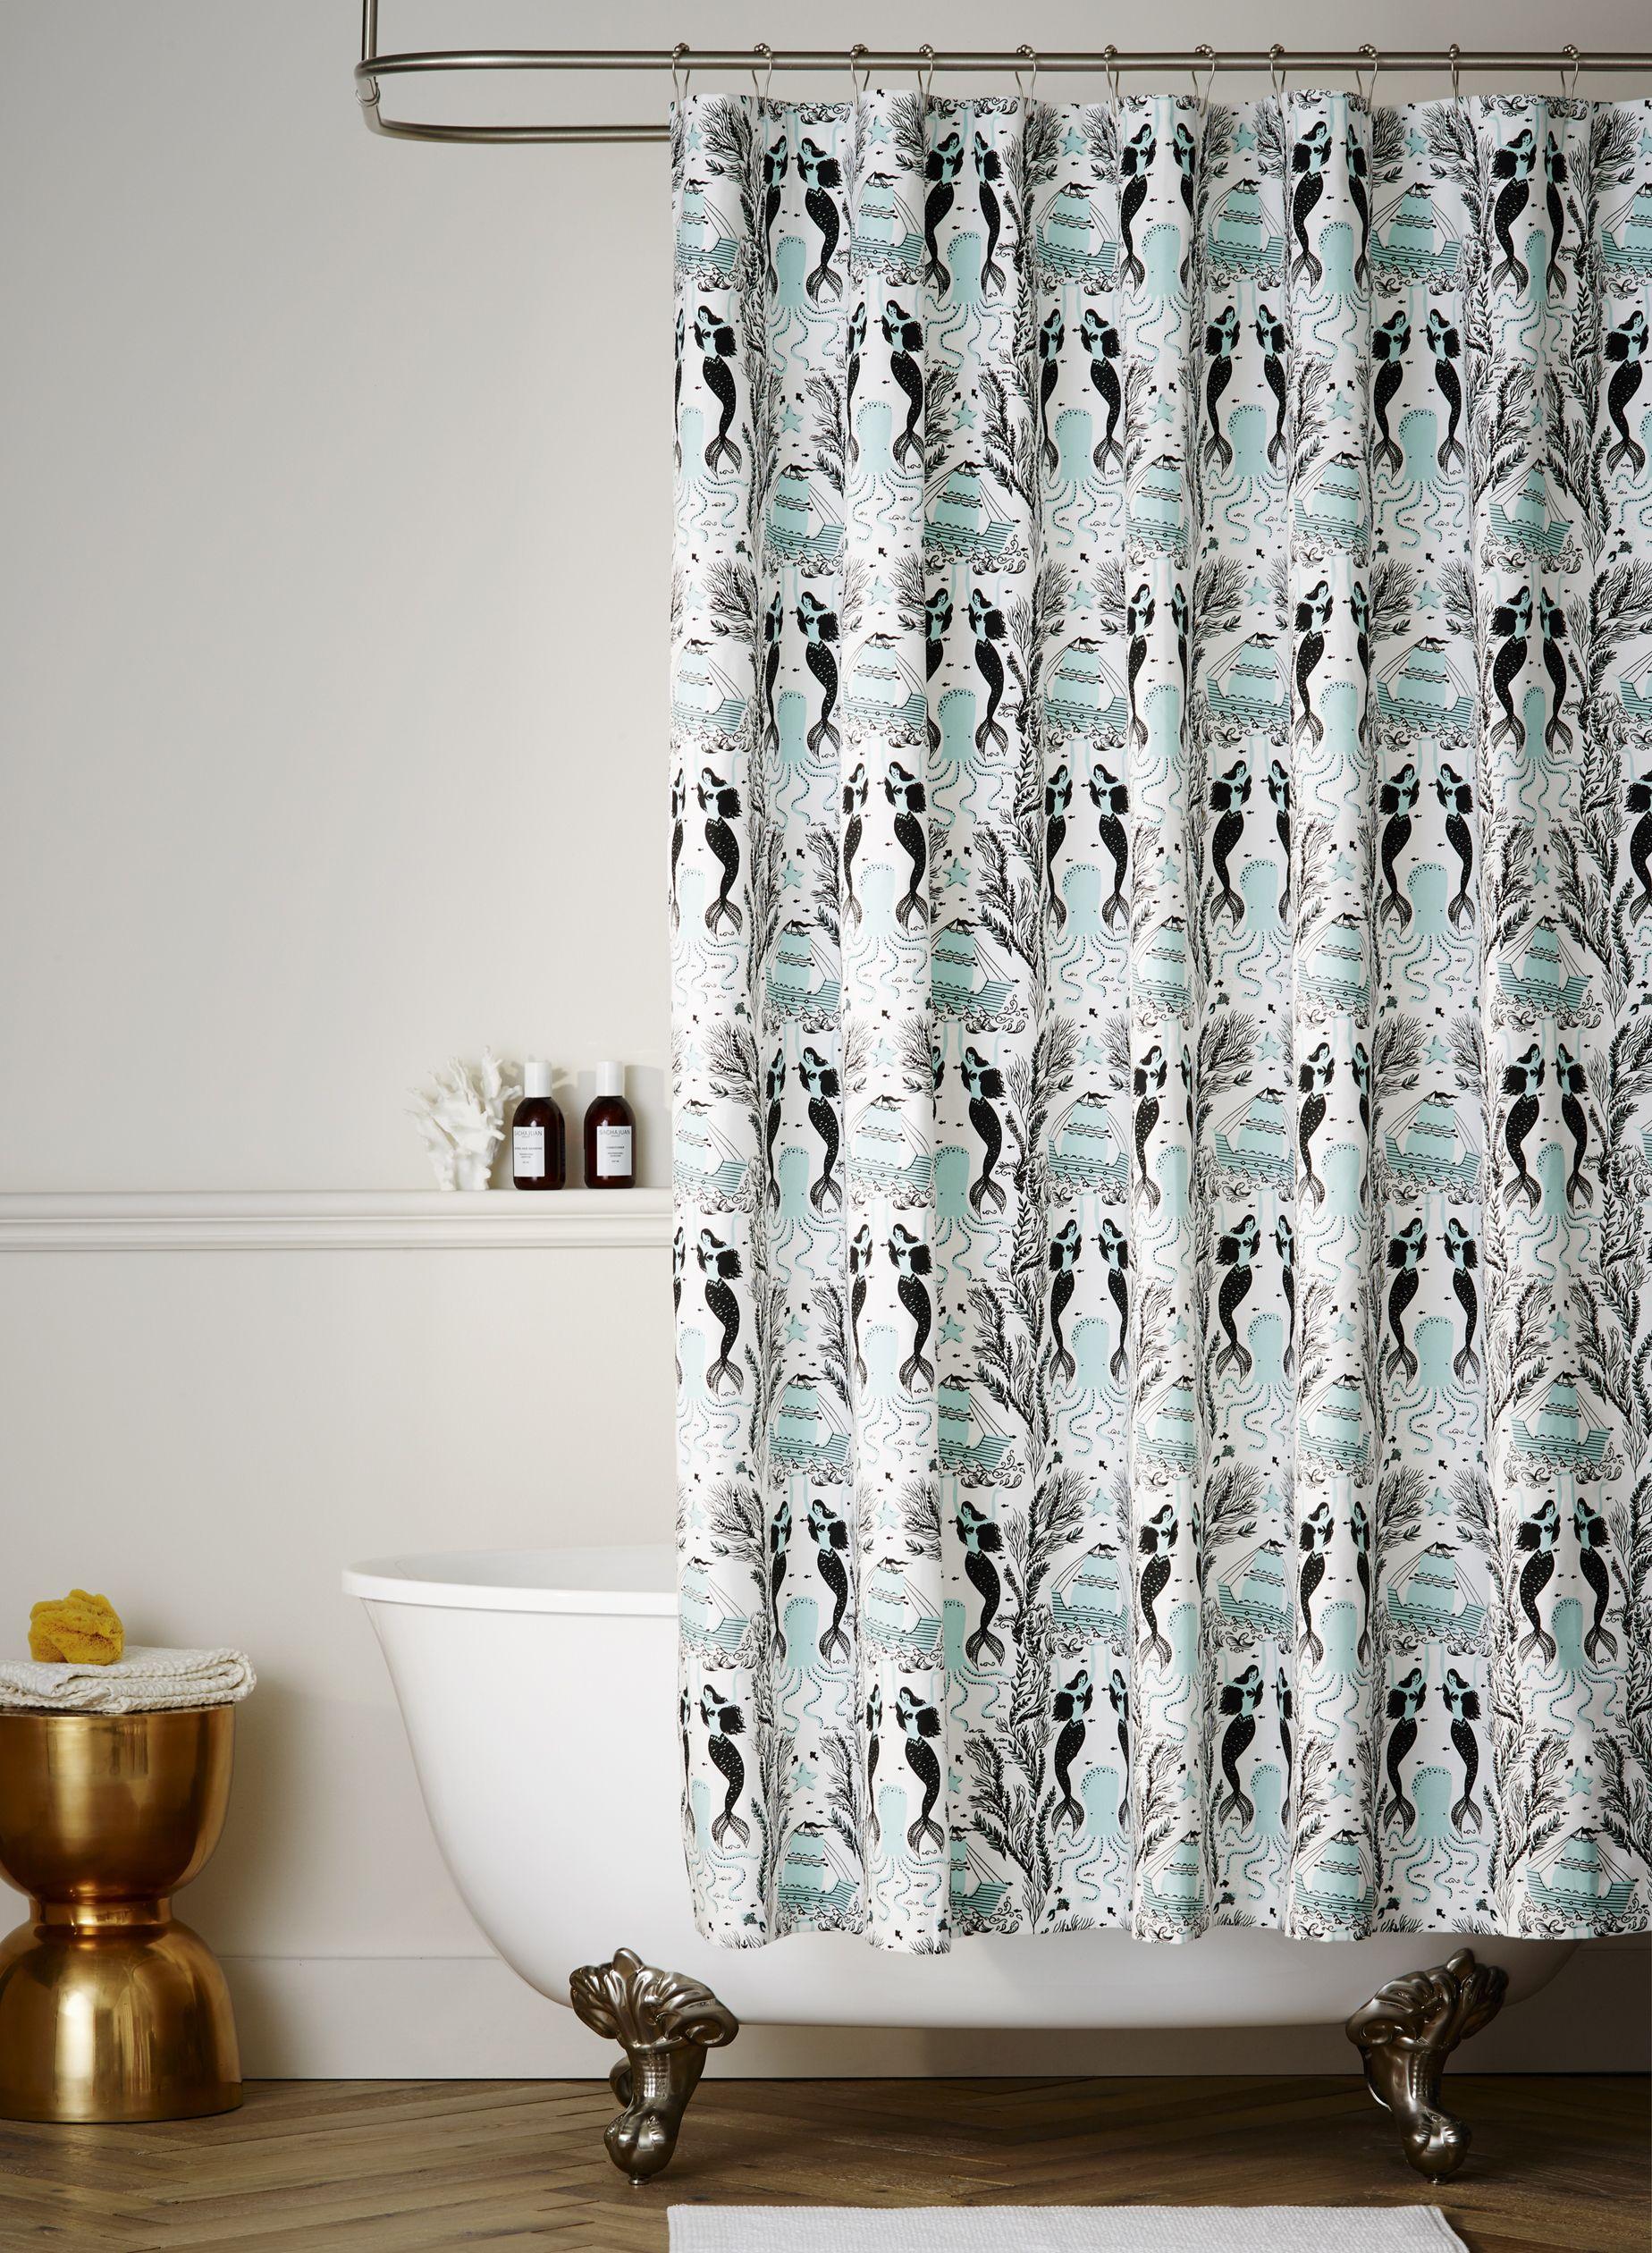 Mermaids (Ocean) Shower Curtain   Decorating 101   Pinterest ...